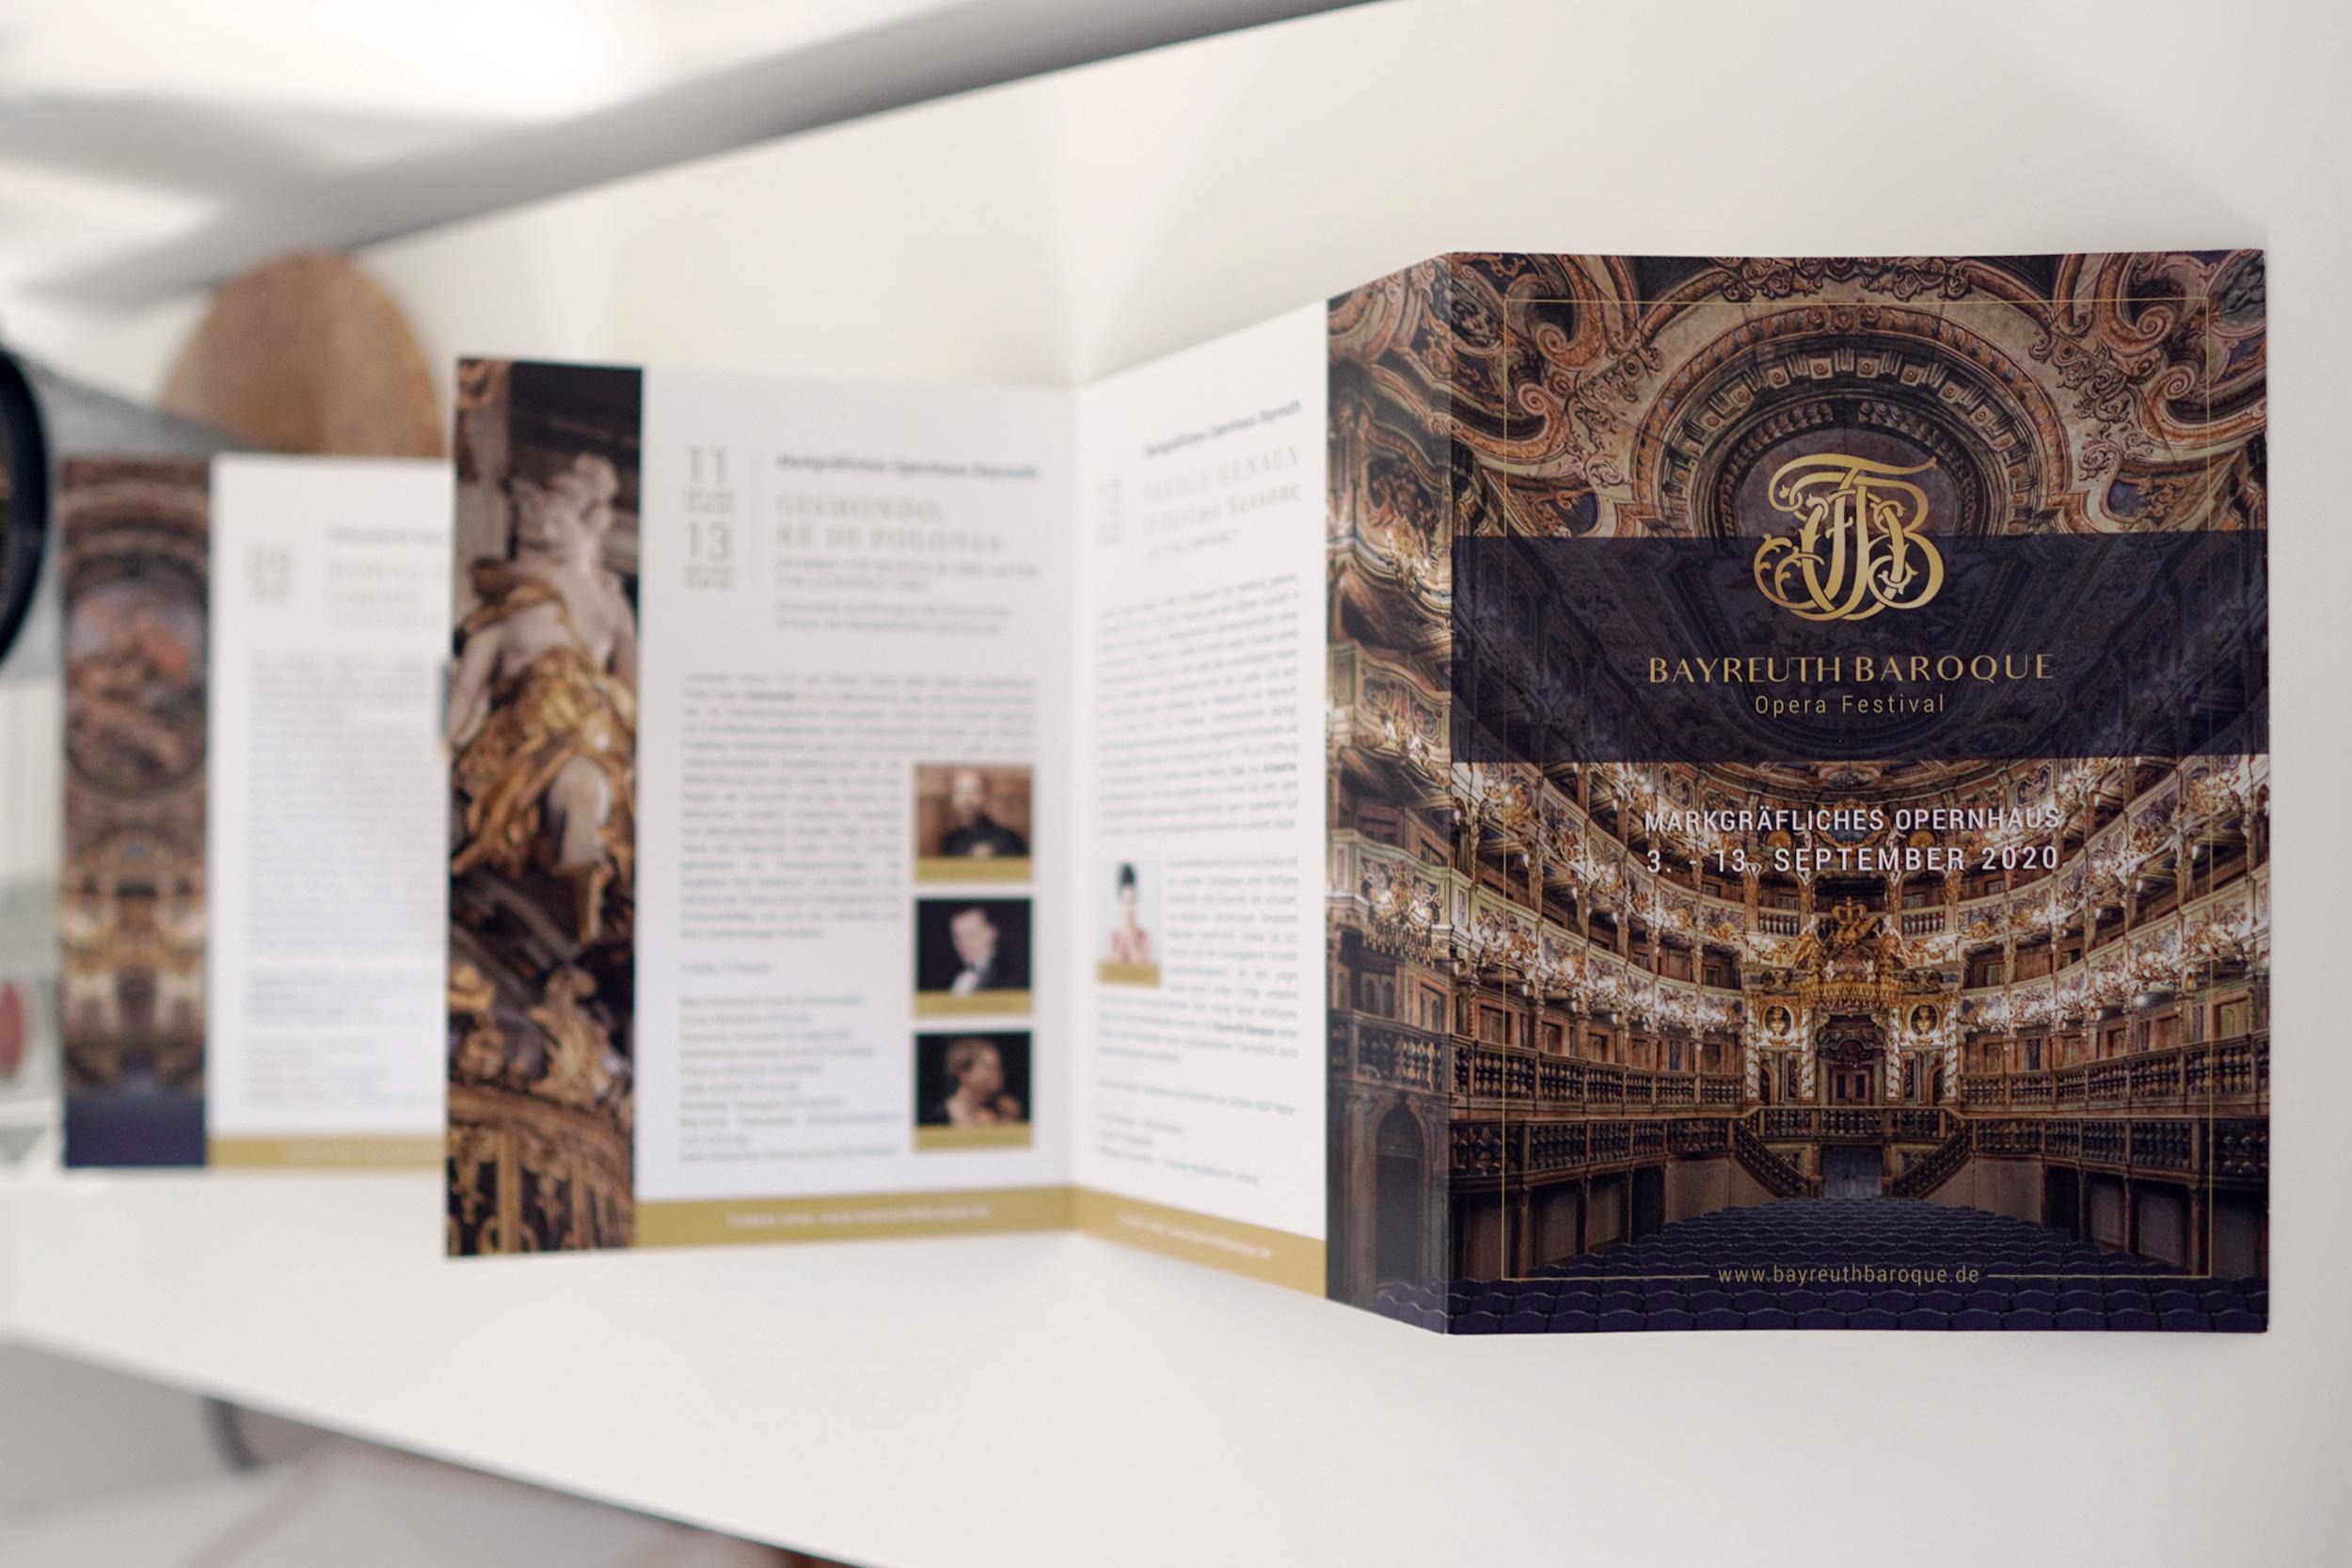 Kilmulis design Bayreuth Baroque Opera Festival Brochure